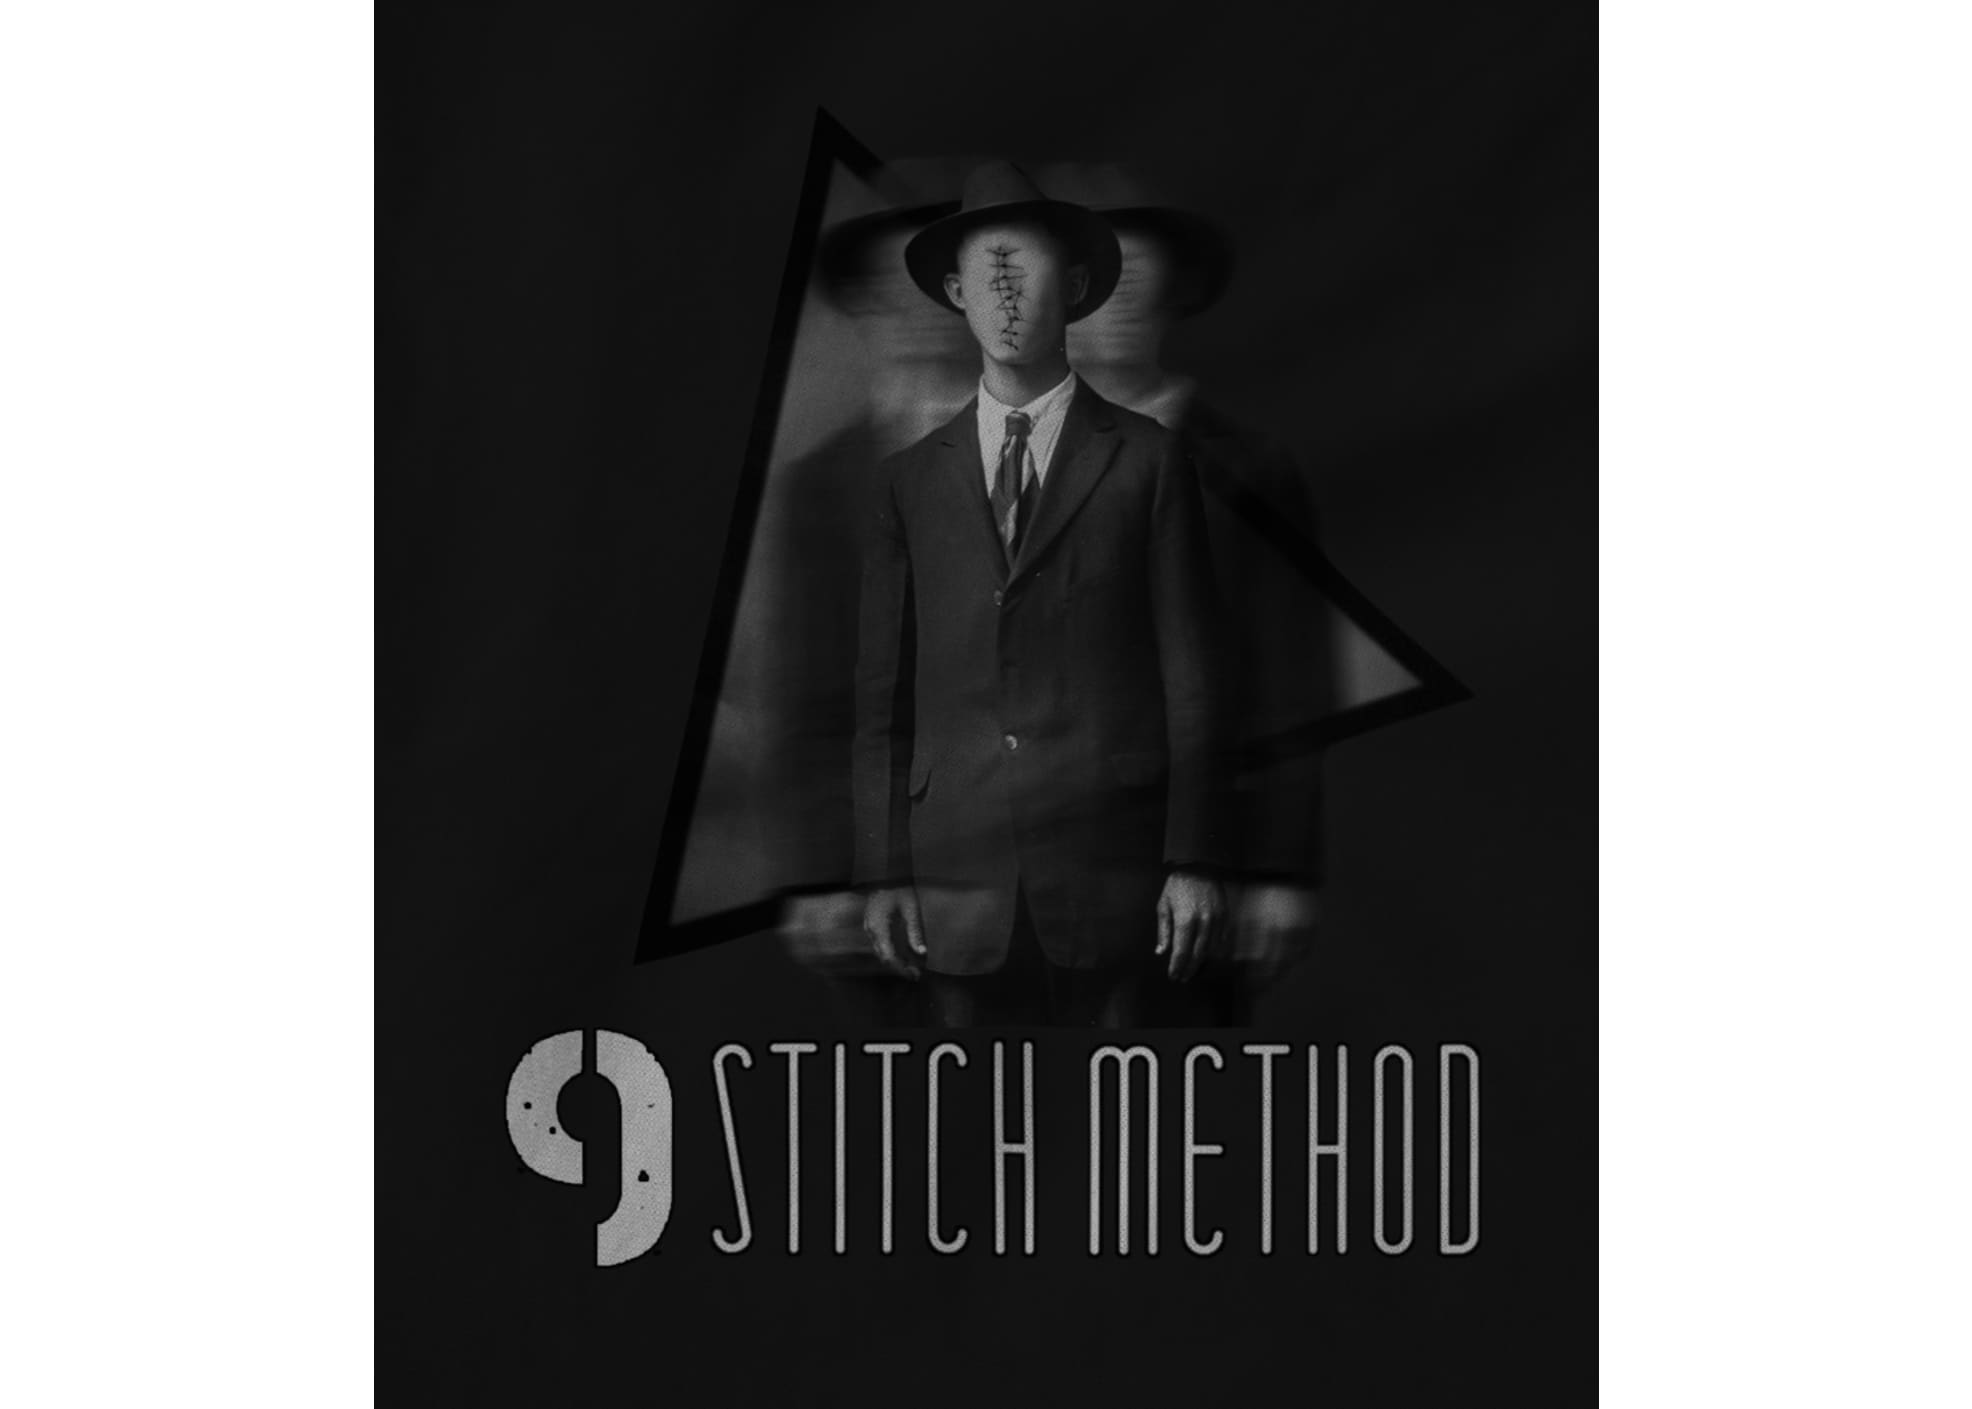 9 stitch method jaywalking somnambulist 1595800339